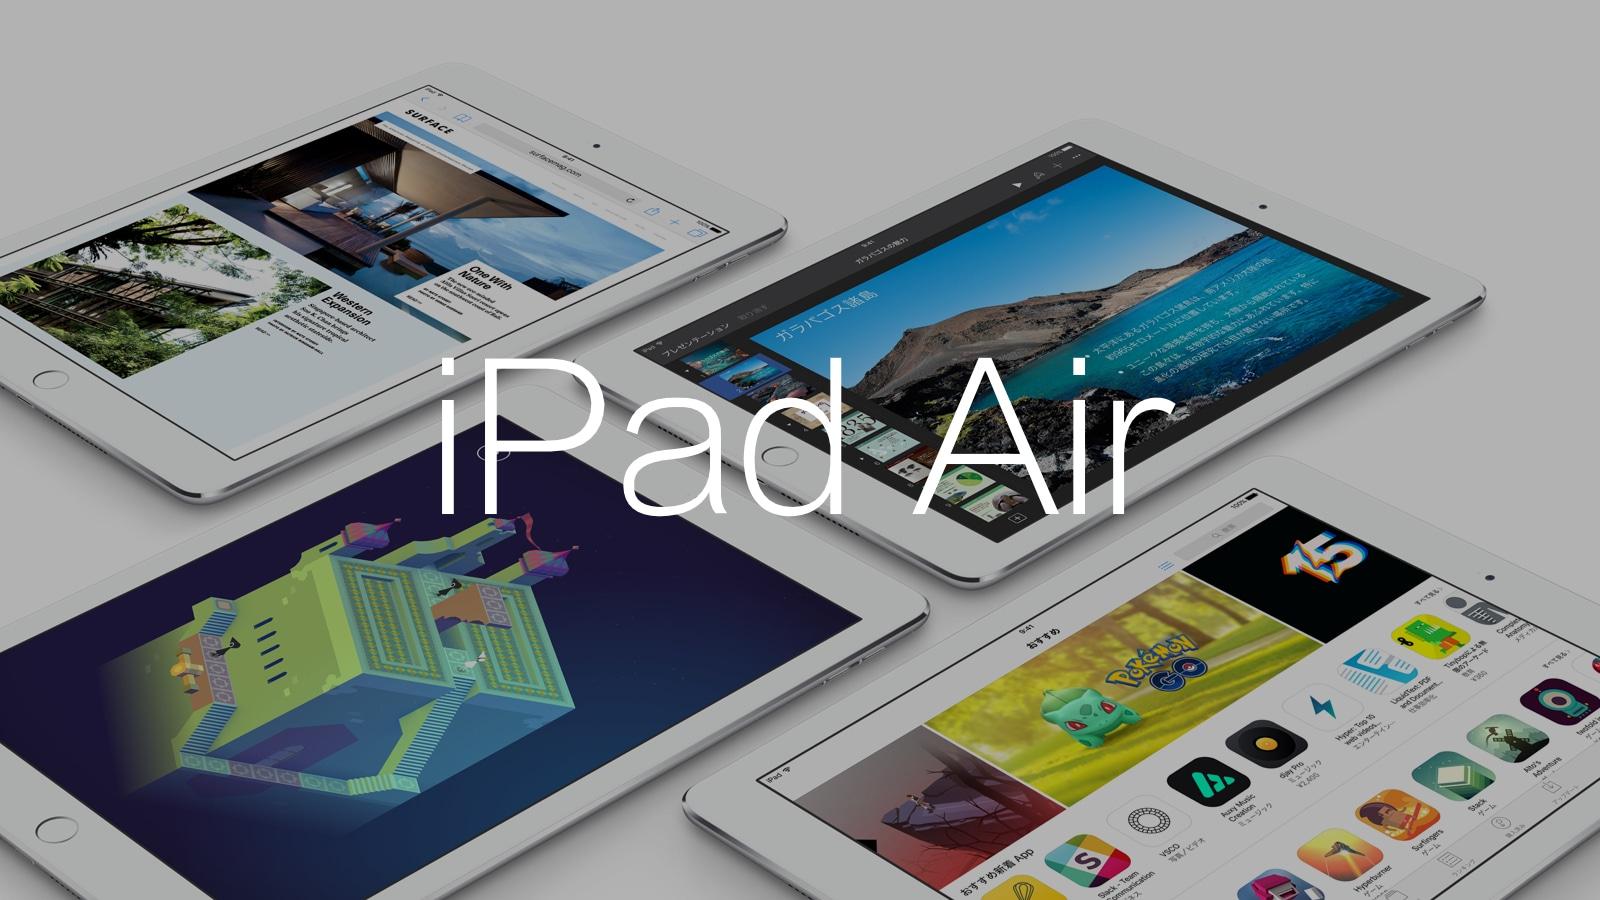 iPad Air 消滅の噂